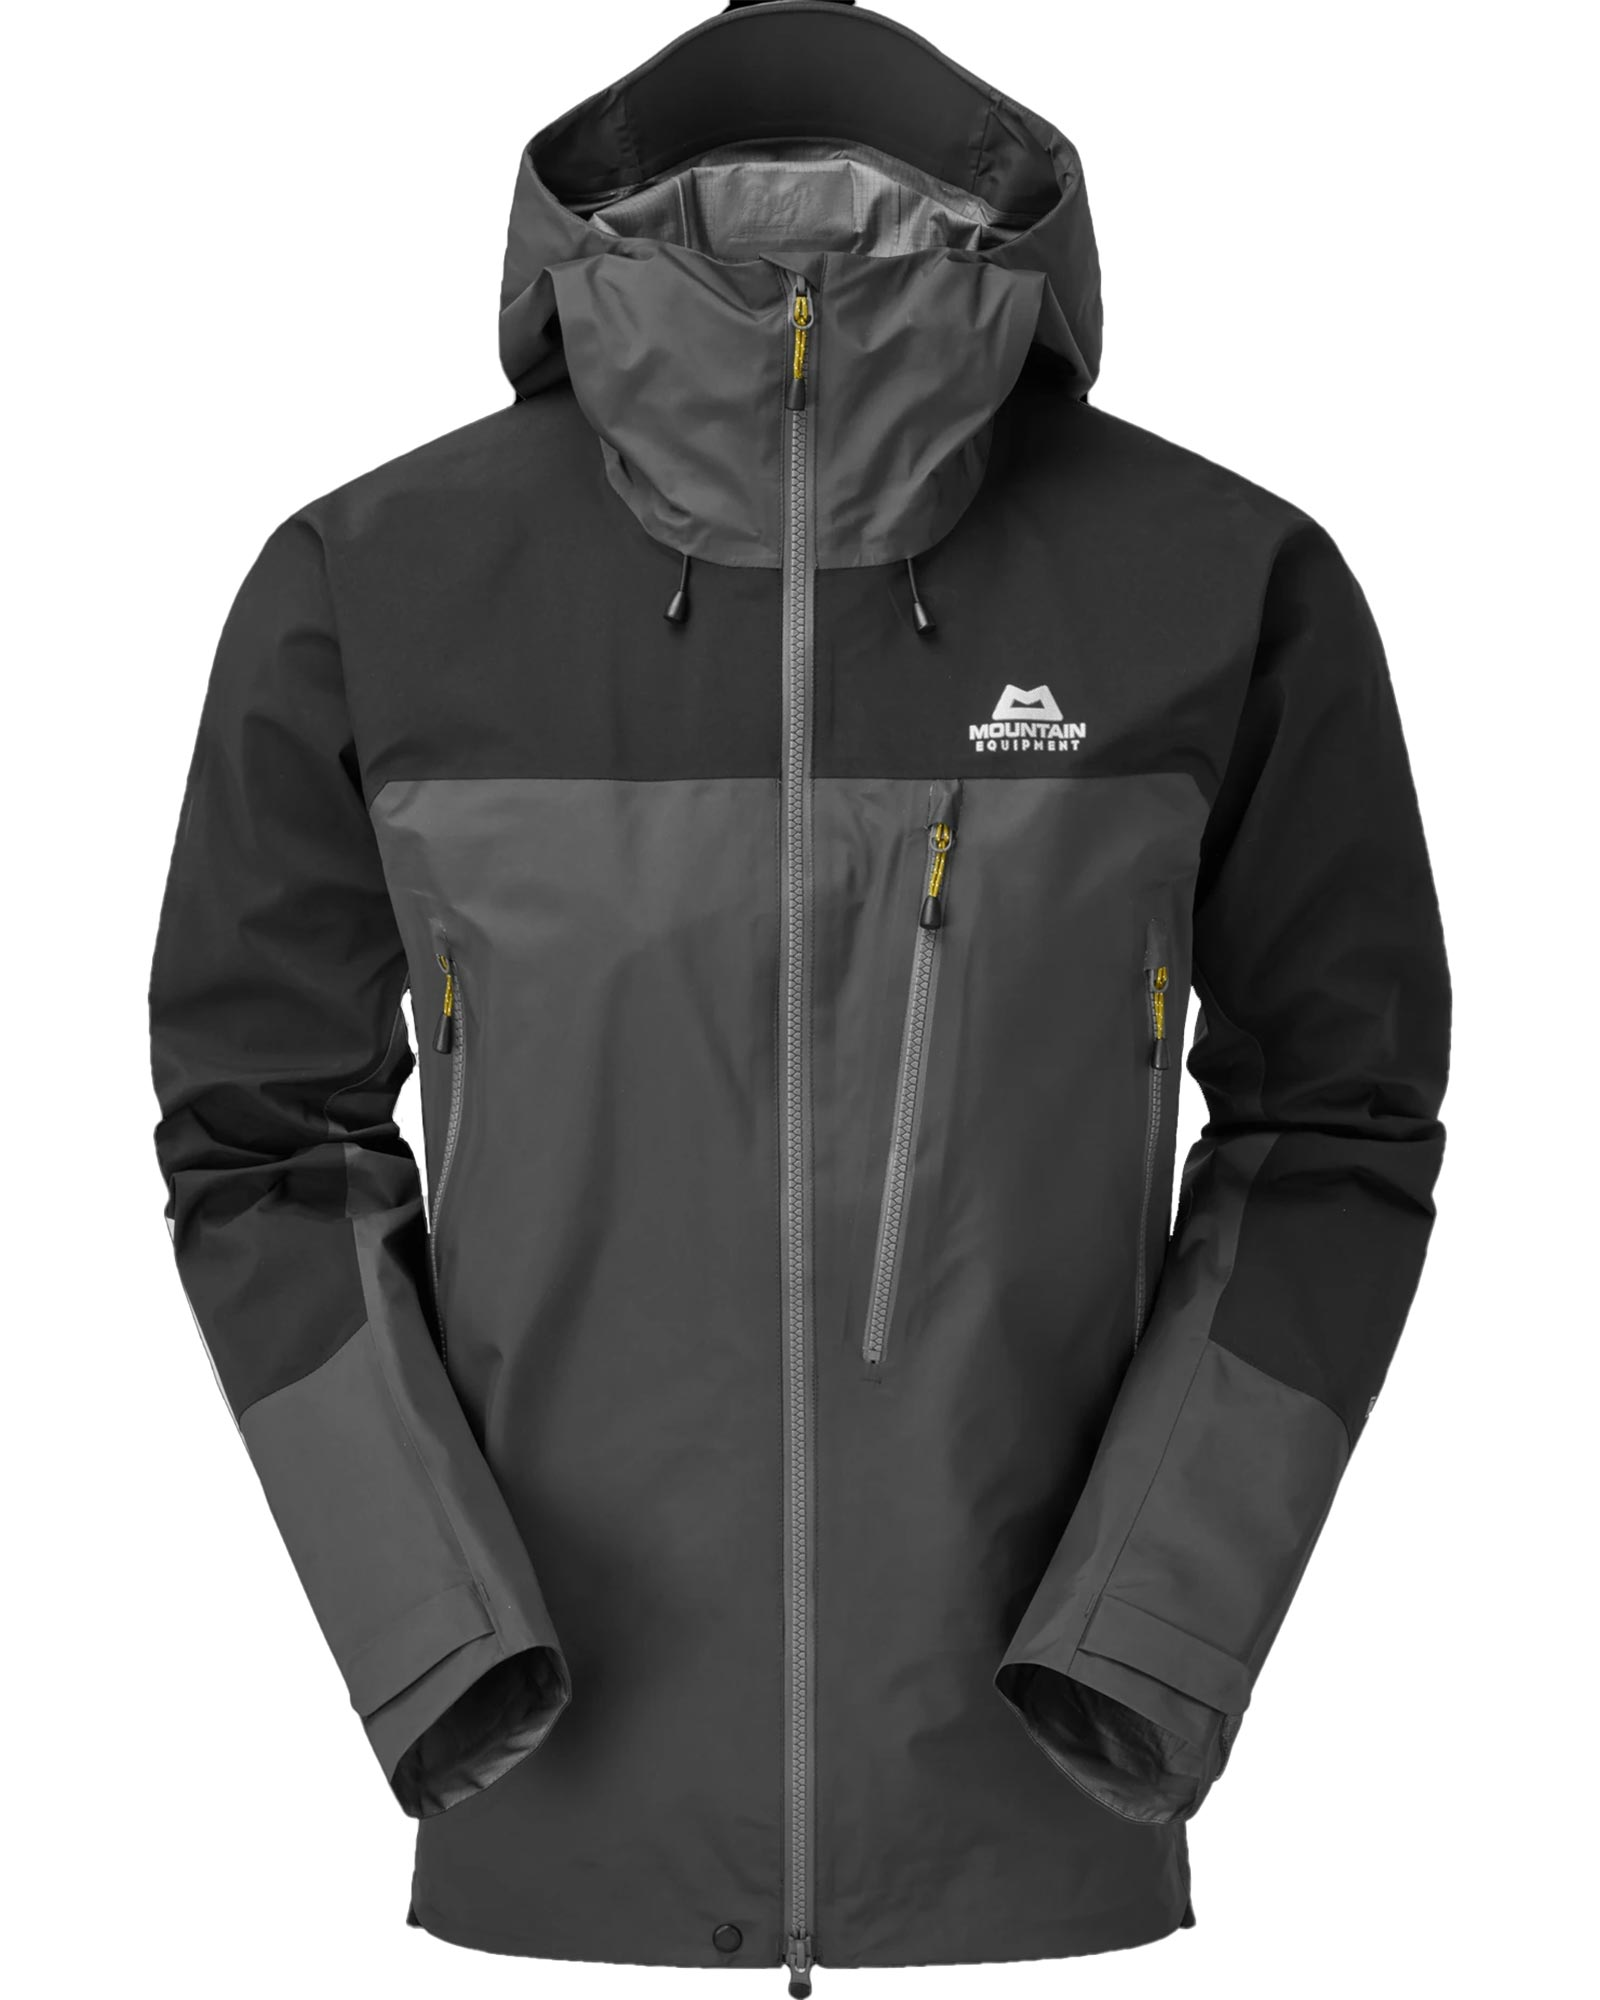 Mountain Equipment Men's Lhotse GORE-TEX Pro Jacket 0